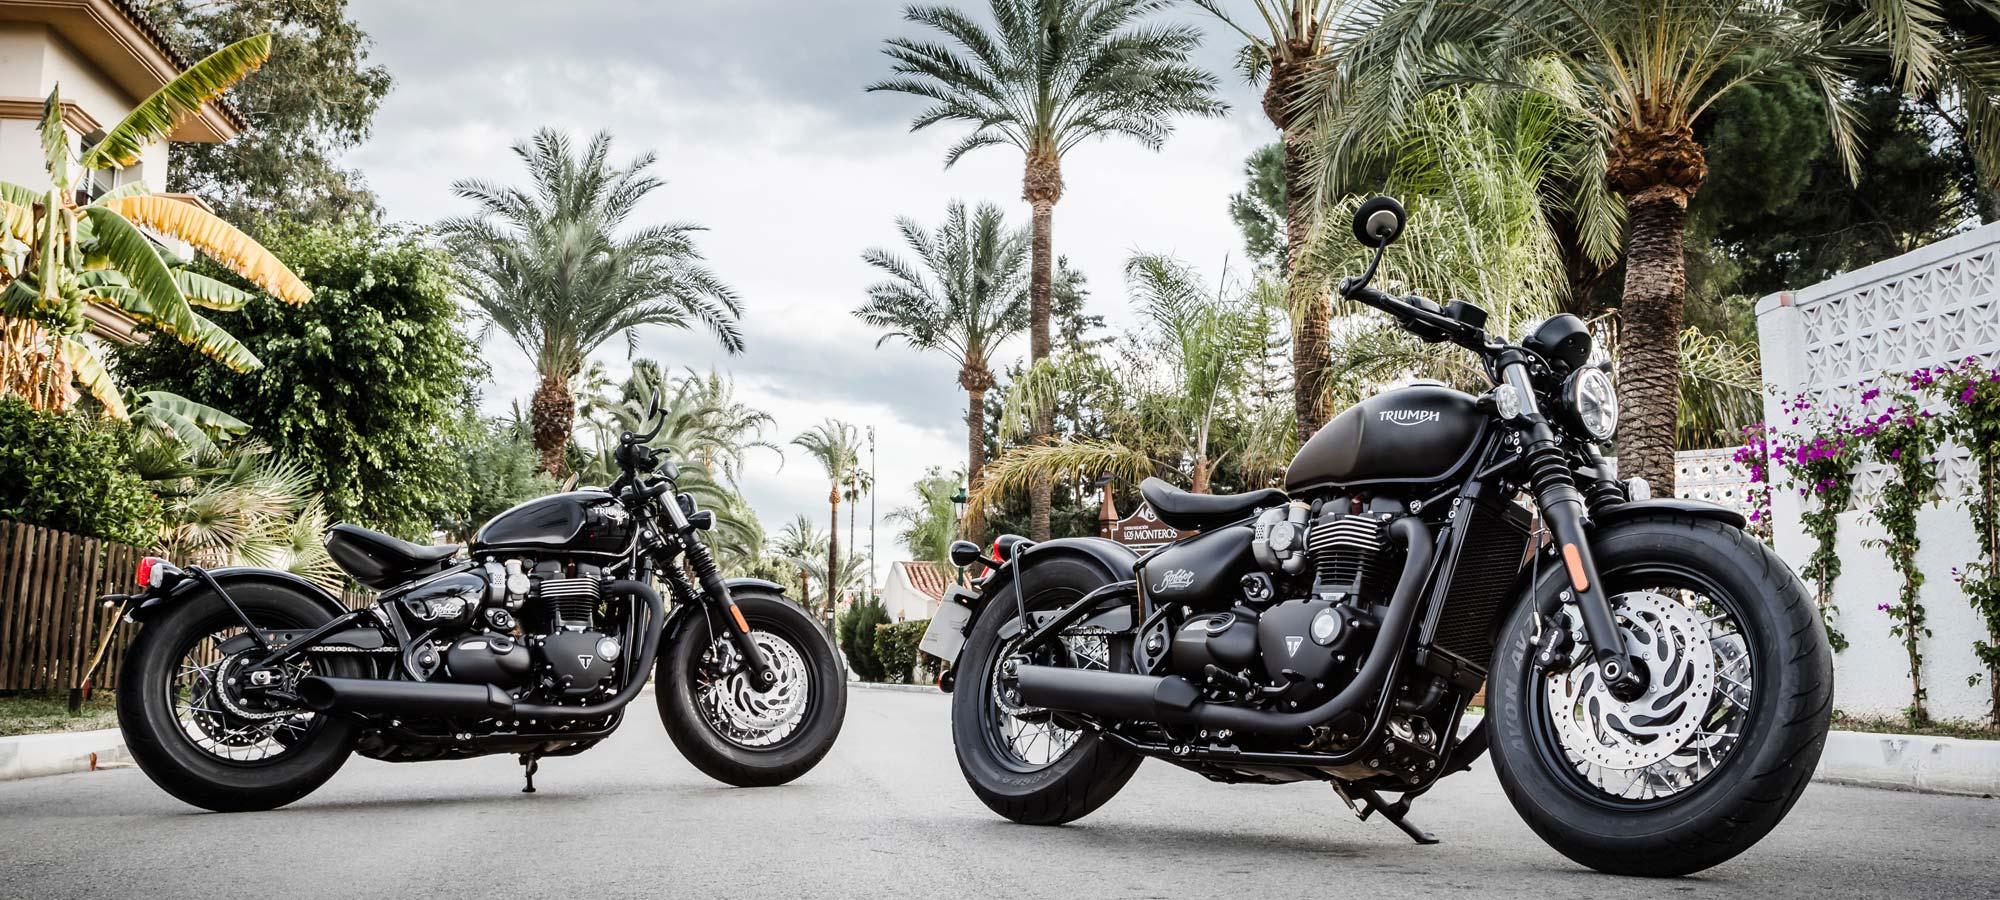 2018 Triumph Bonneville Bobber Black Motorcycle Review Cycle World